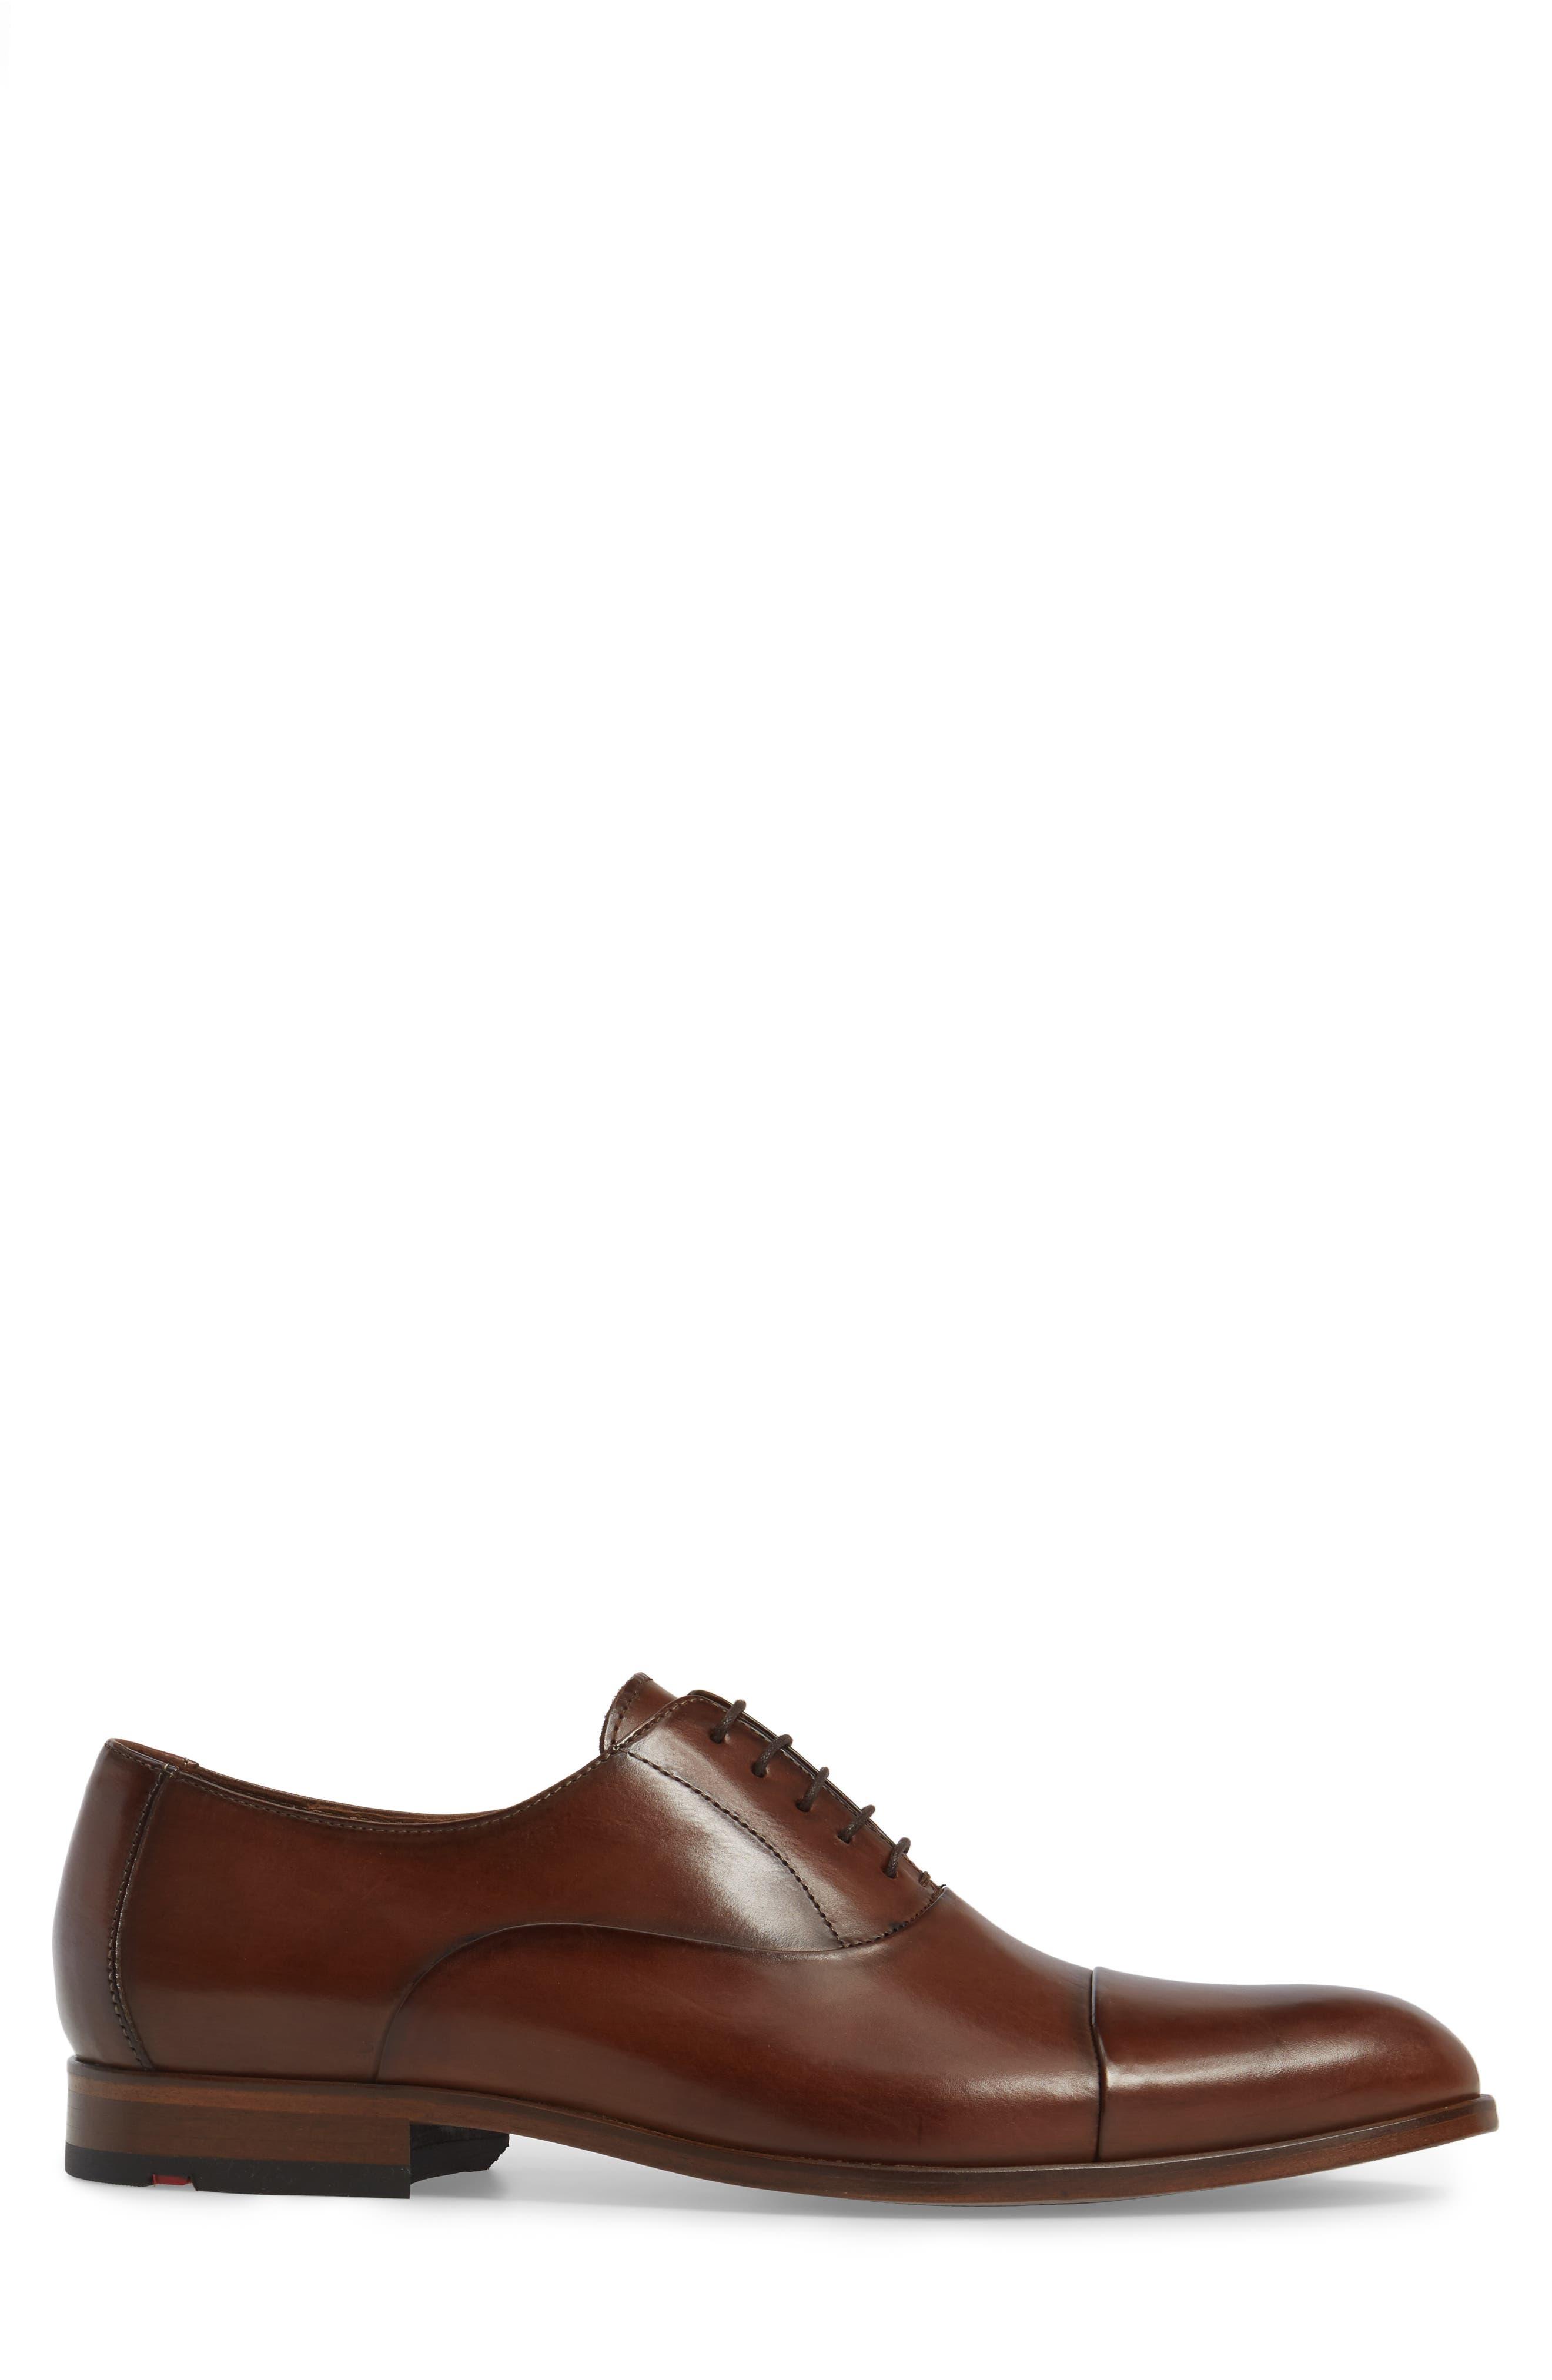 Malik Cap-Toe Oxford,                             Alternate thumbnail 3, color,                             Brown Leather